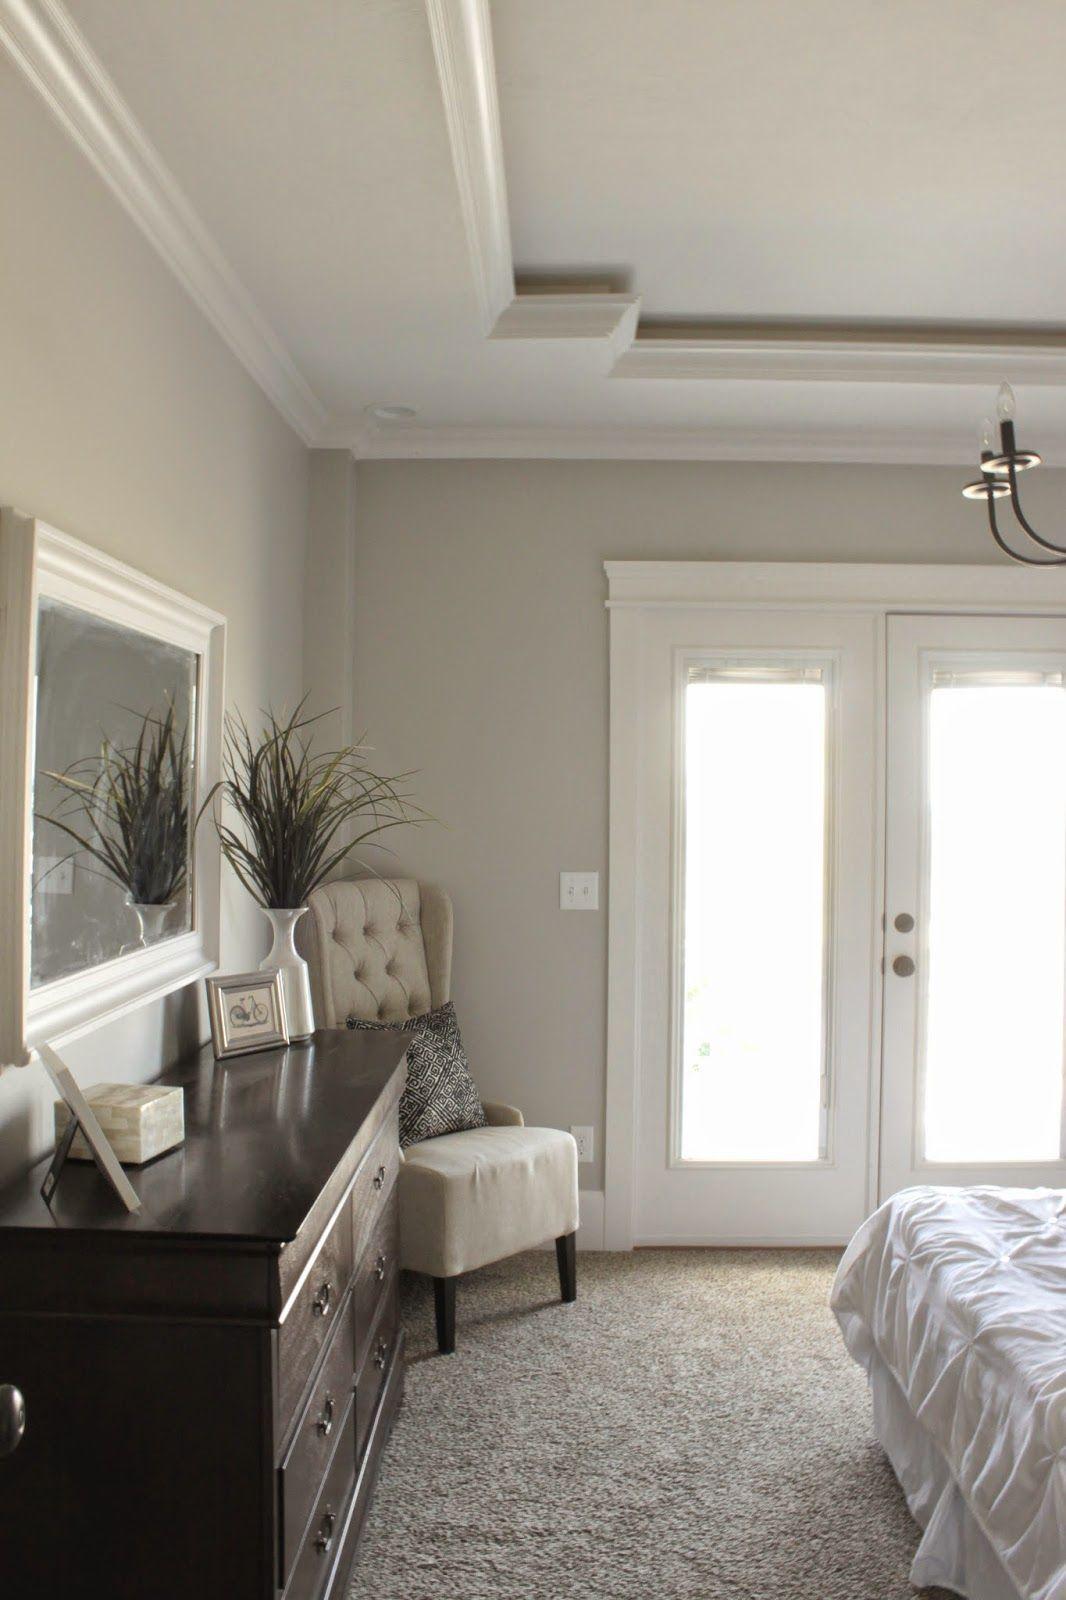 Bedroom. Unique Tray Ceiling. Sherwin Williams Repose Gray